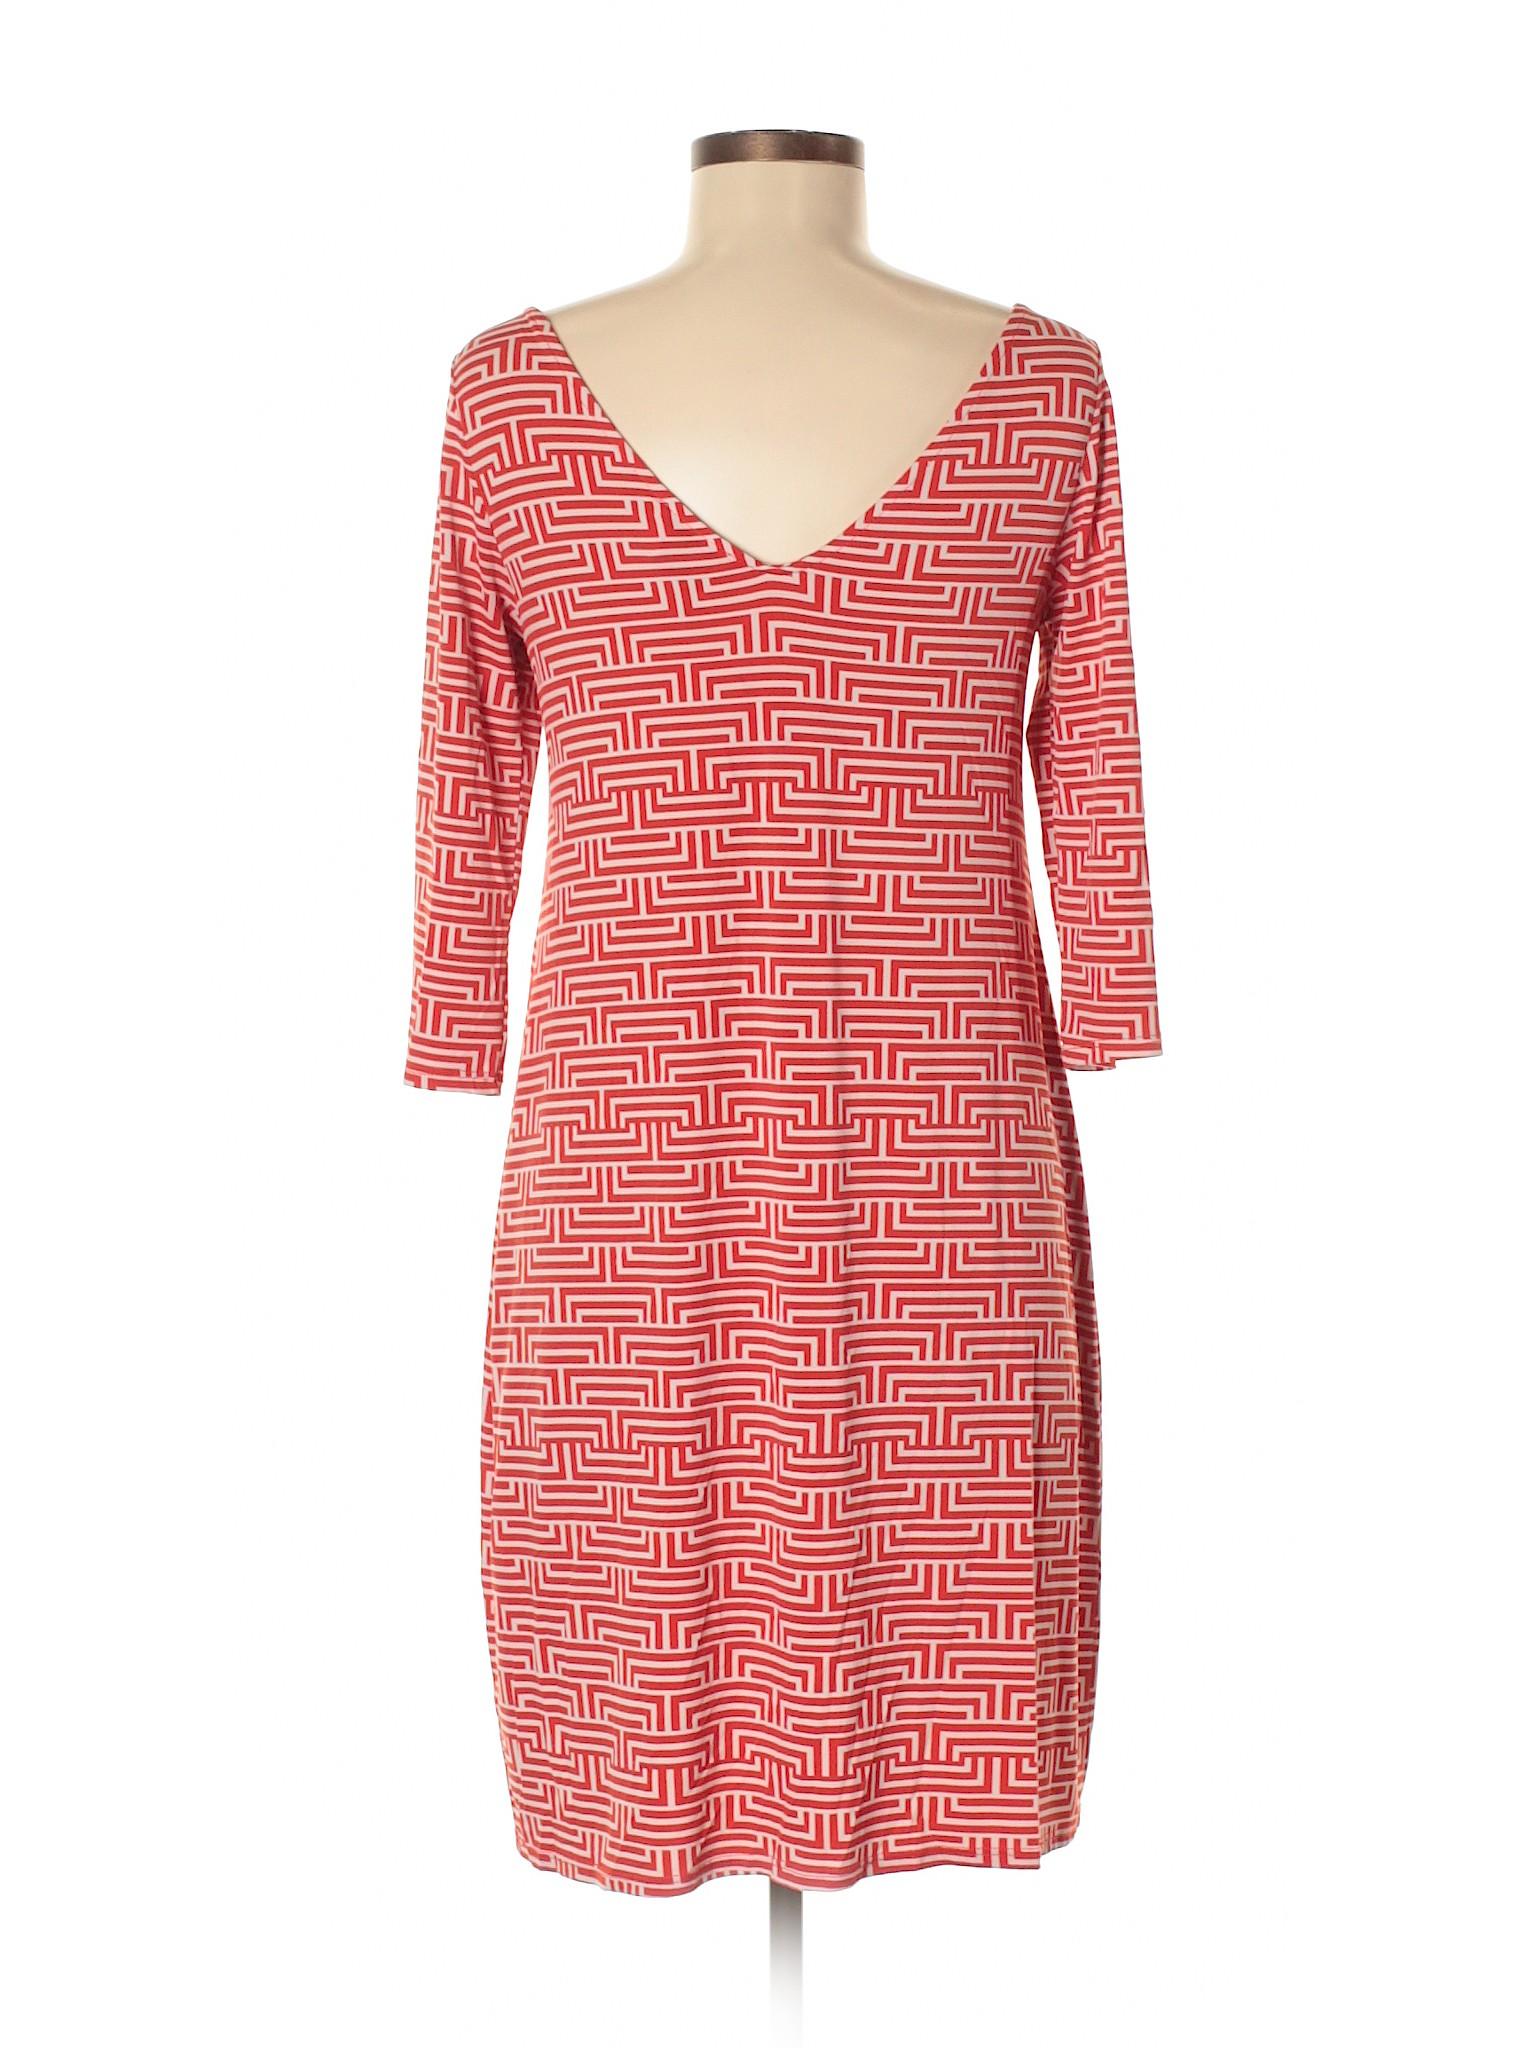 Selling Casual Dress Leota Leota Dress Selling Selling Casual BBYqdZ